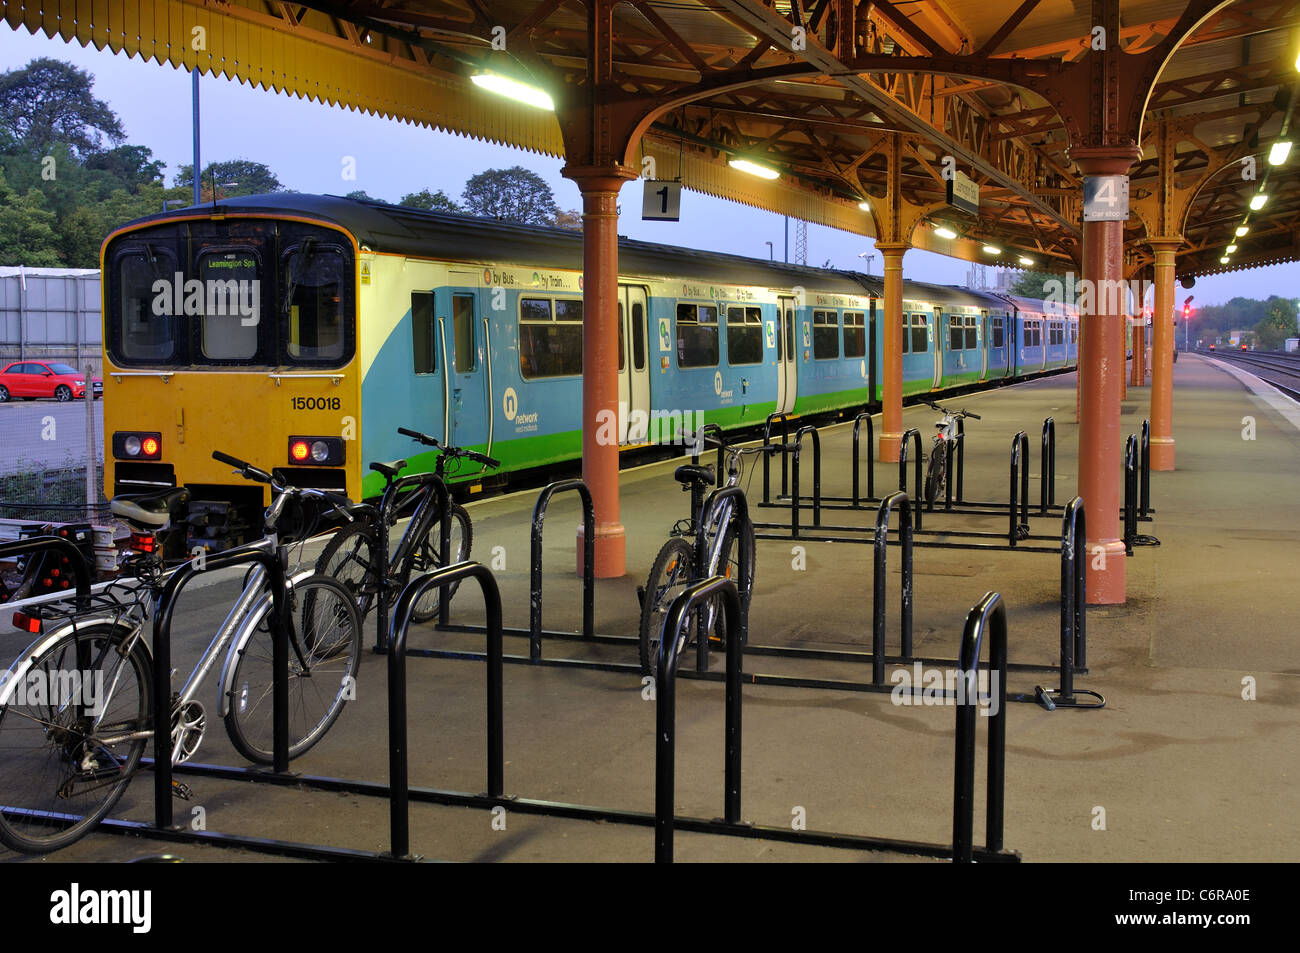 Network West Midlands trains at Leamington Spa railway station, early morning, Warwickshire, England, UK - Stock Image